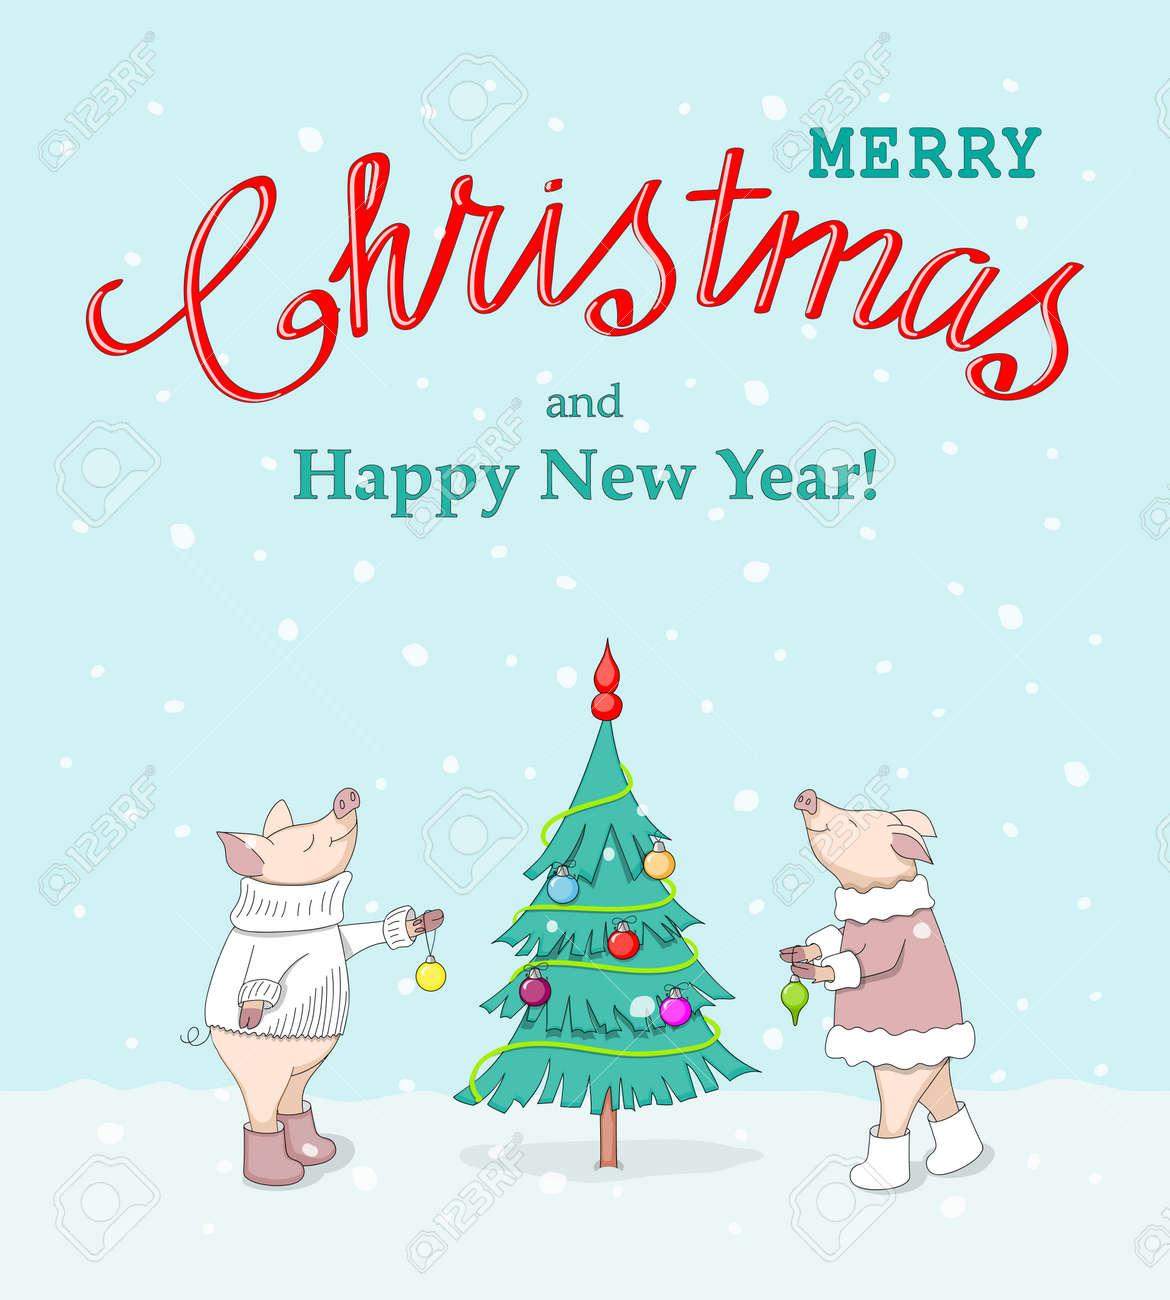 new year card with handwritten text merry christmas decorating fir tree cute cartoon piglets